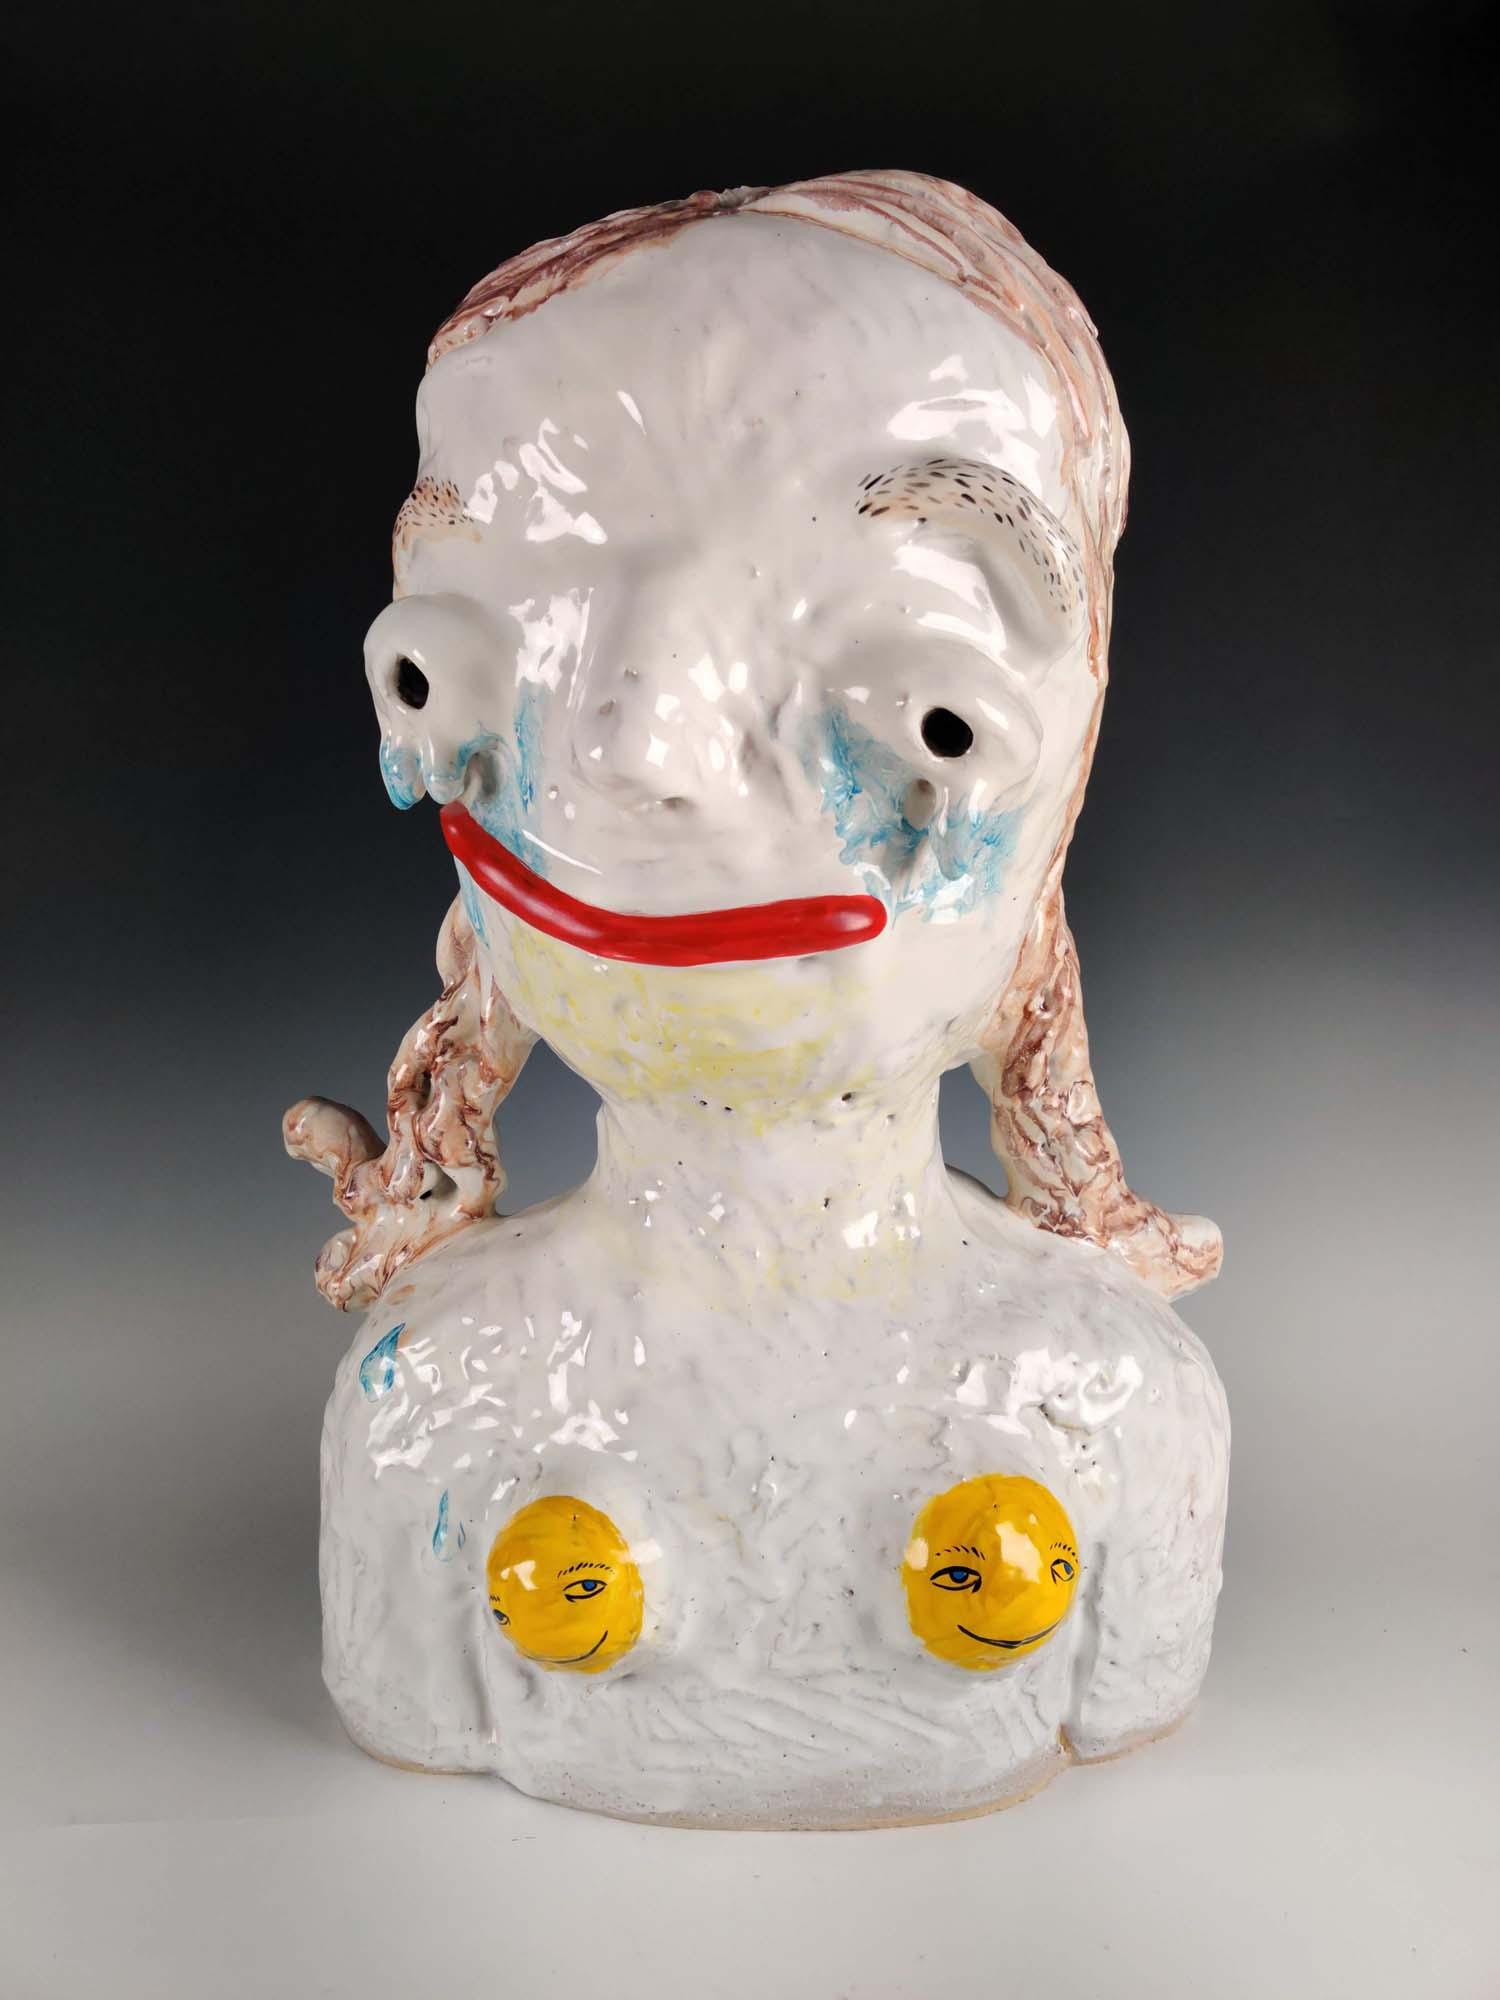 cartoon-like ceramic bust of a smiling girl